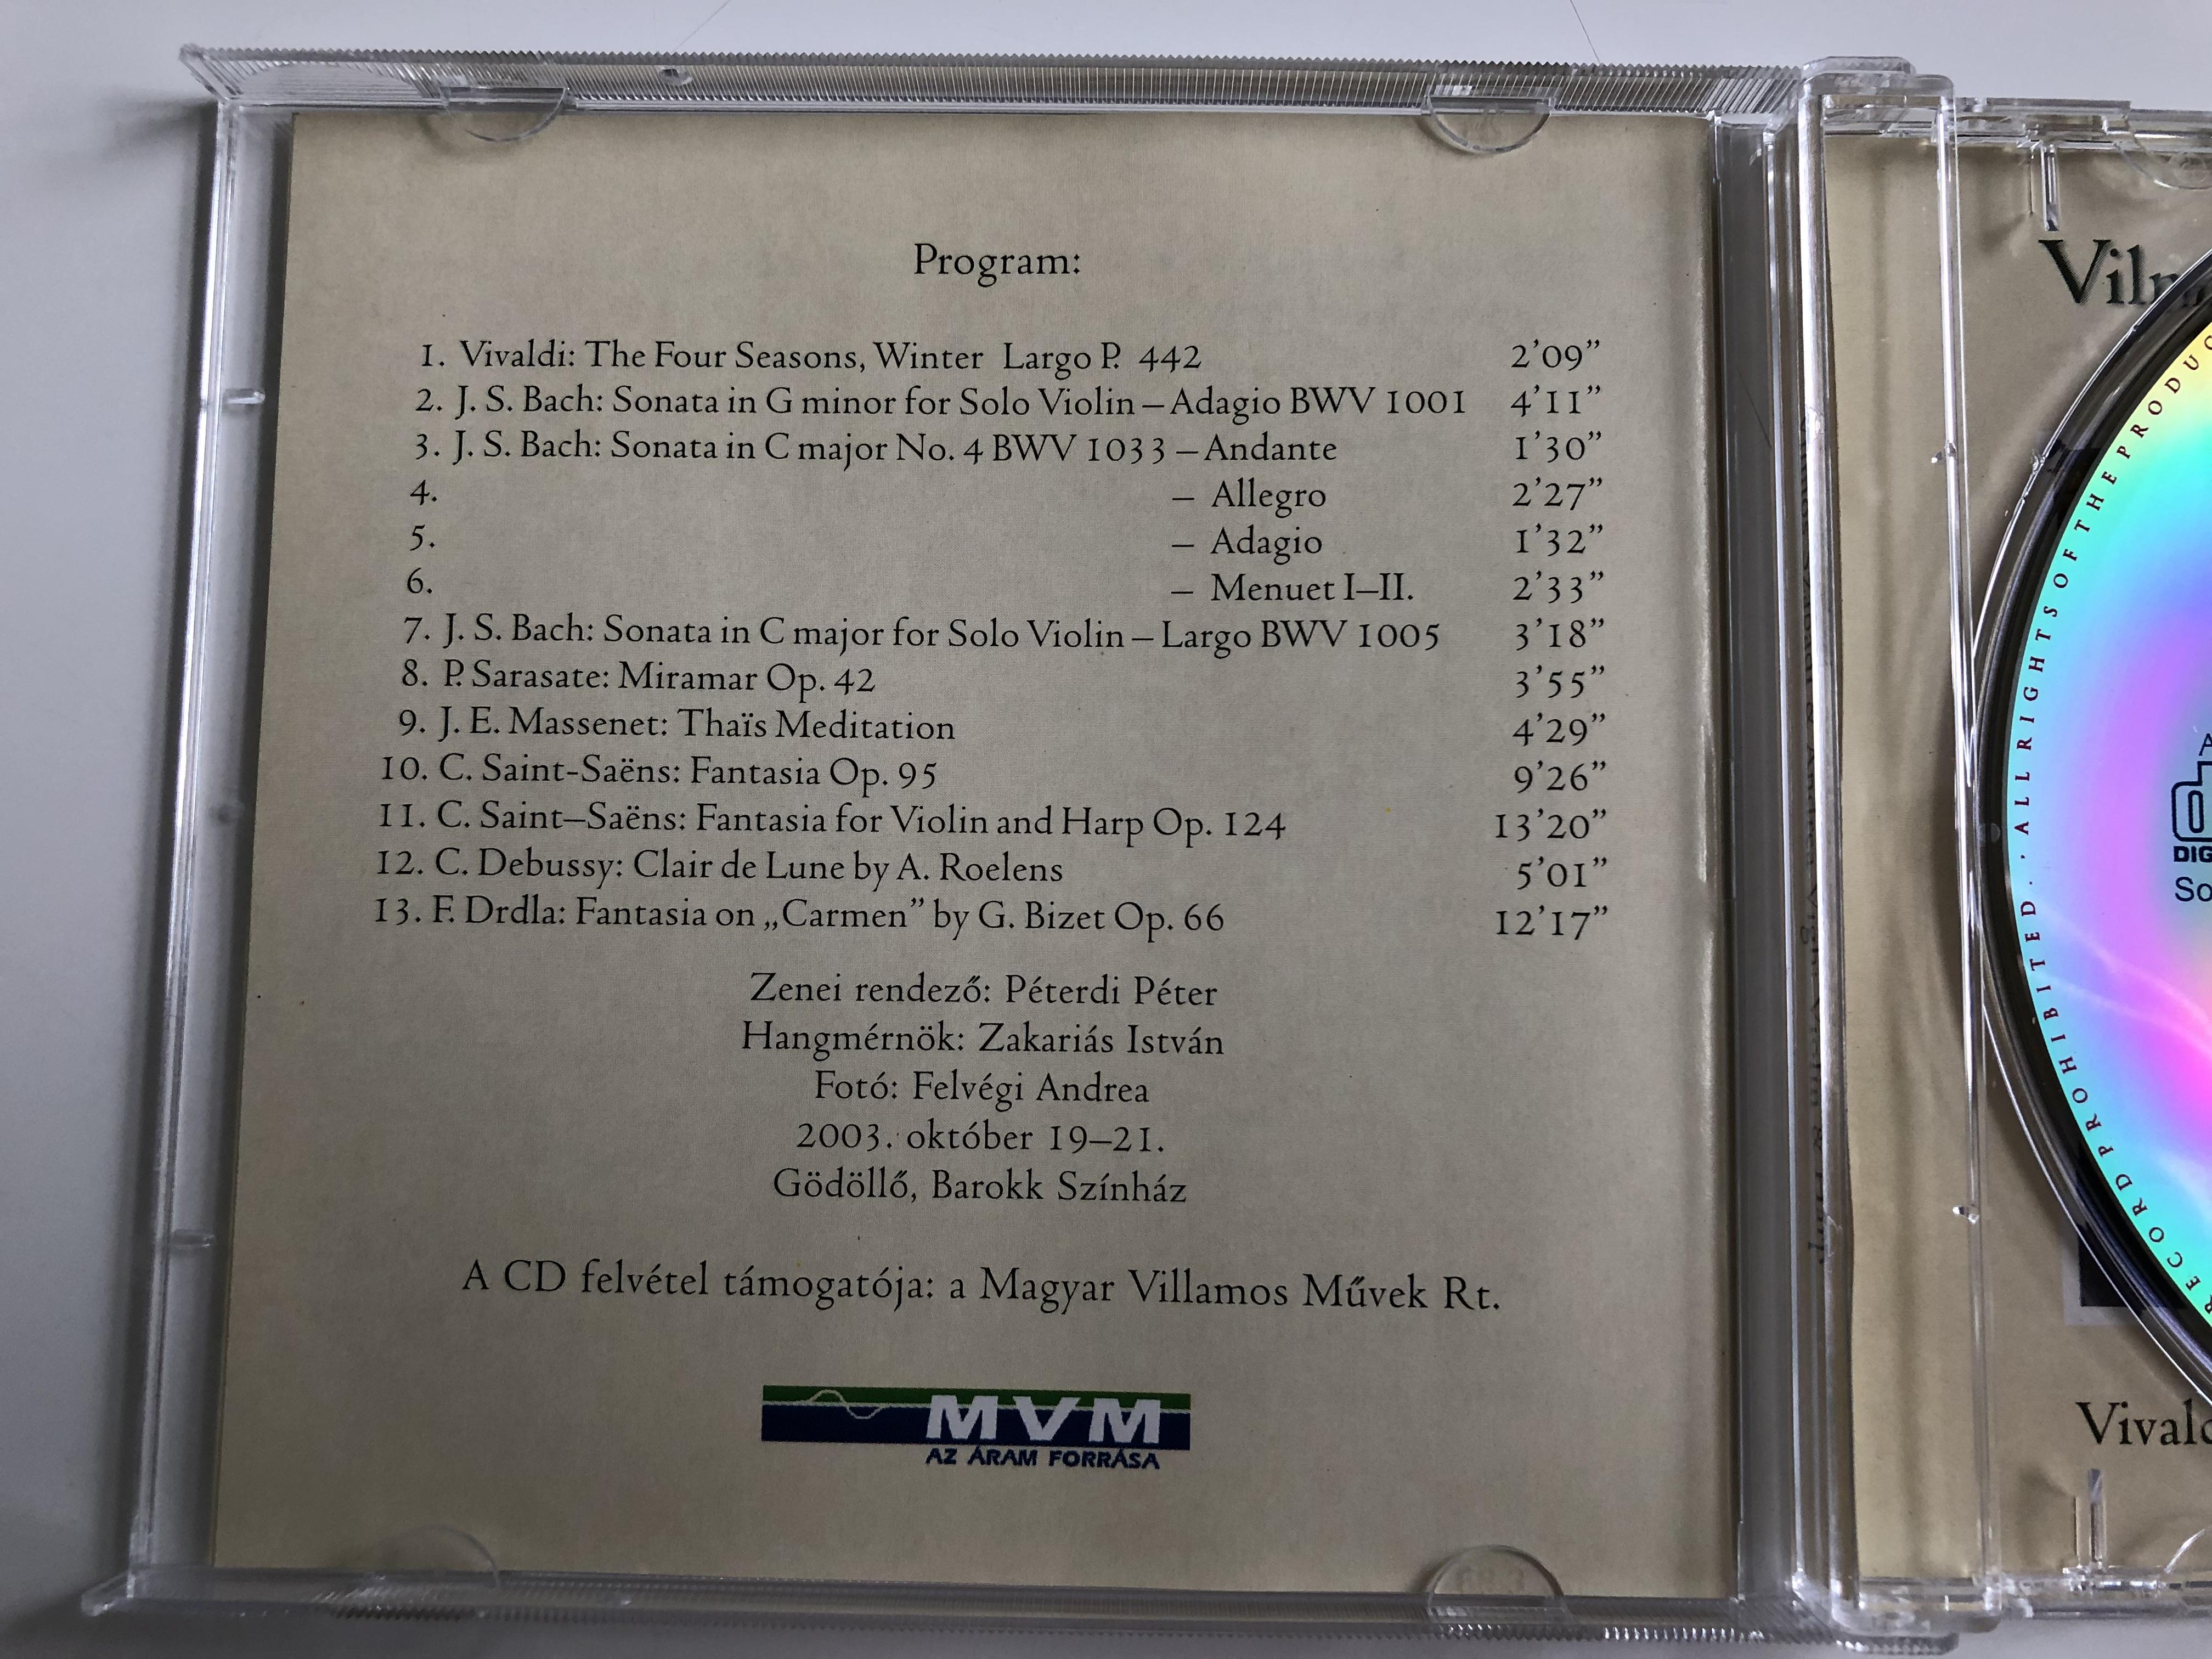 vilmos-szabadi-violin-andrea-vigh-harp-vivaldi-bach-saint-saens-debussy-bizet-sarasate-jakobi-koncert-kft.-audio-cd-2003-jk-k-2003-5-.jpg